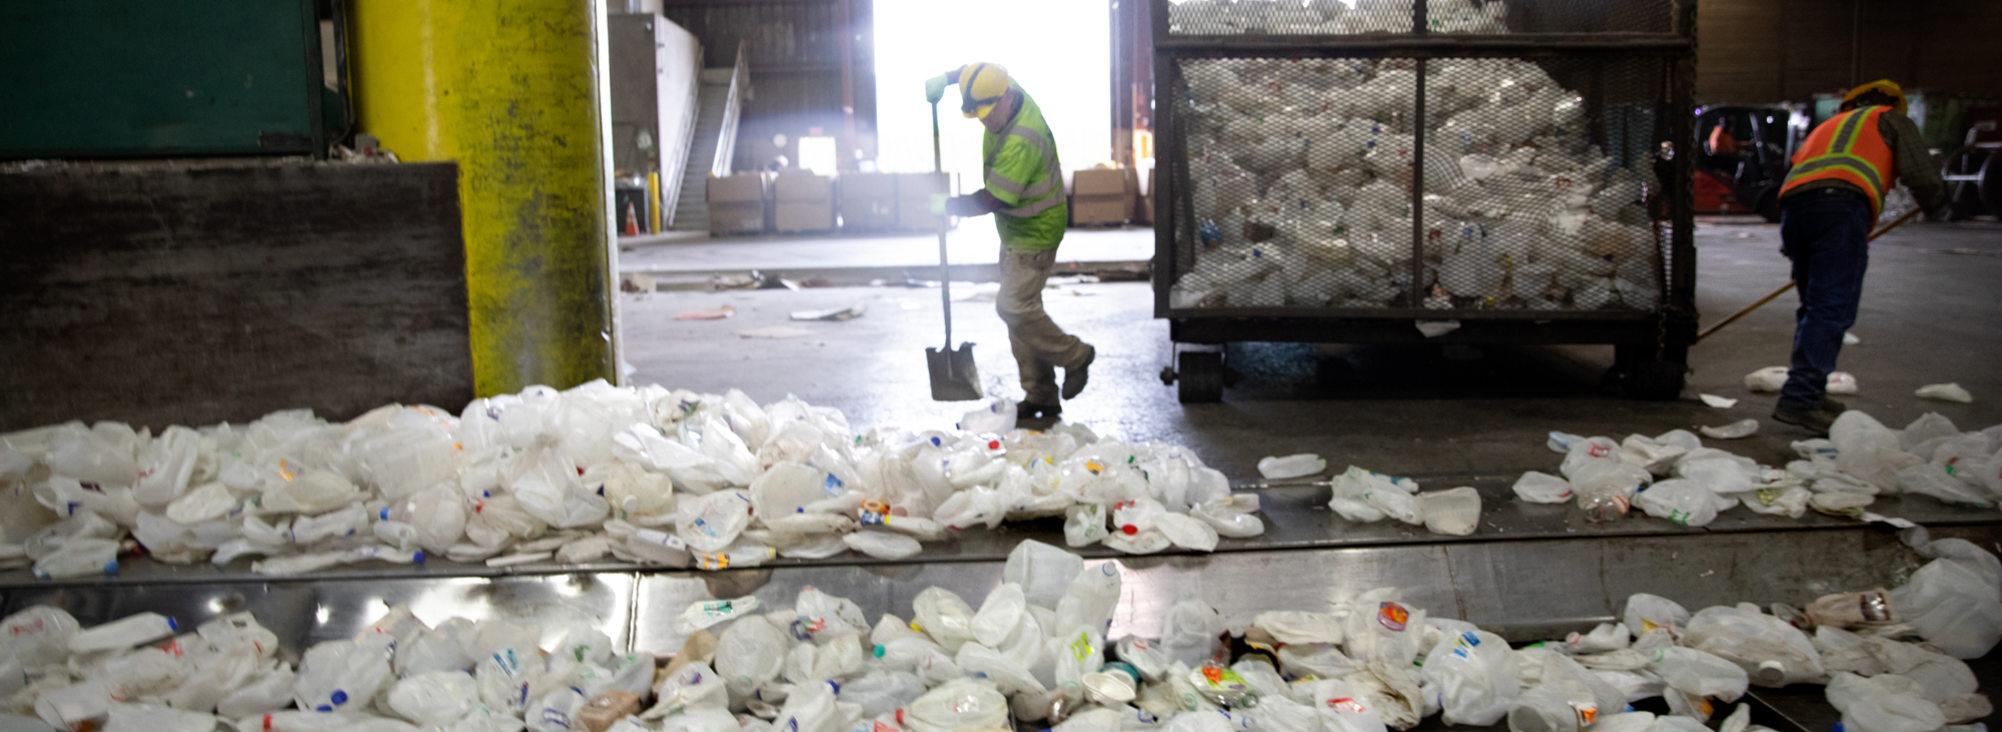 Workers push hundreds of plastic milk jugs onto a conveyor belt